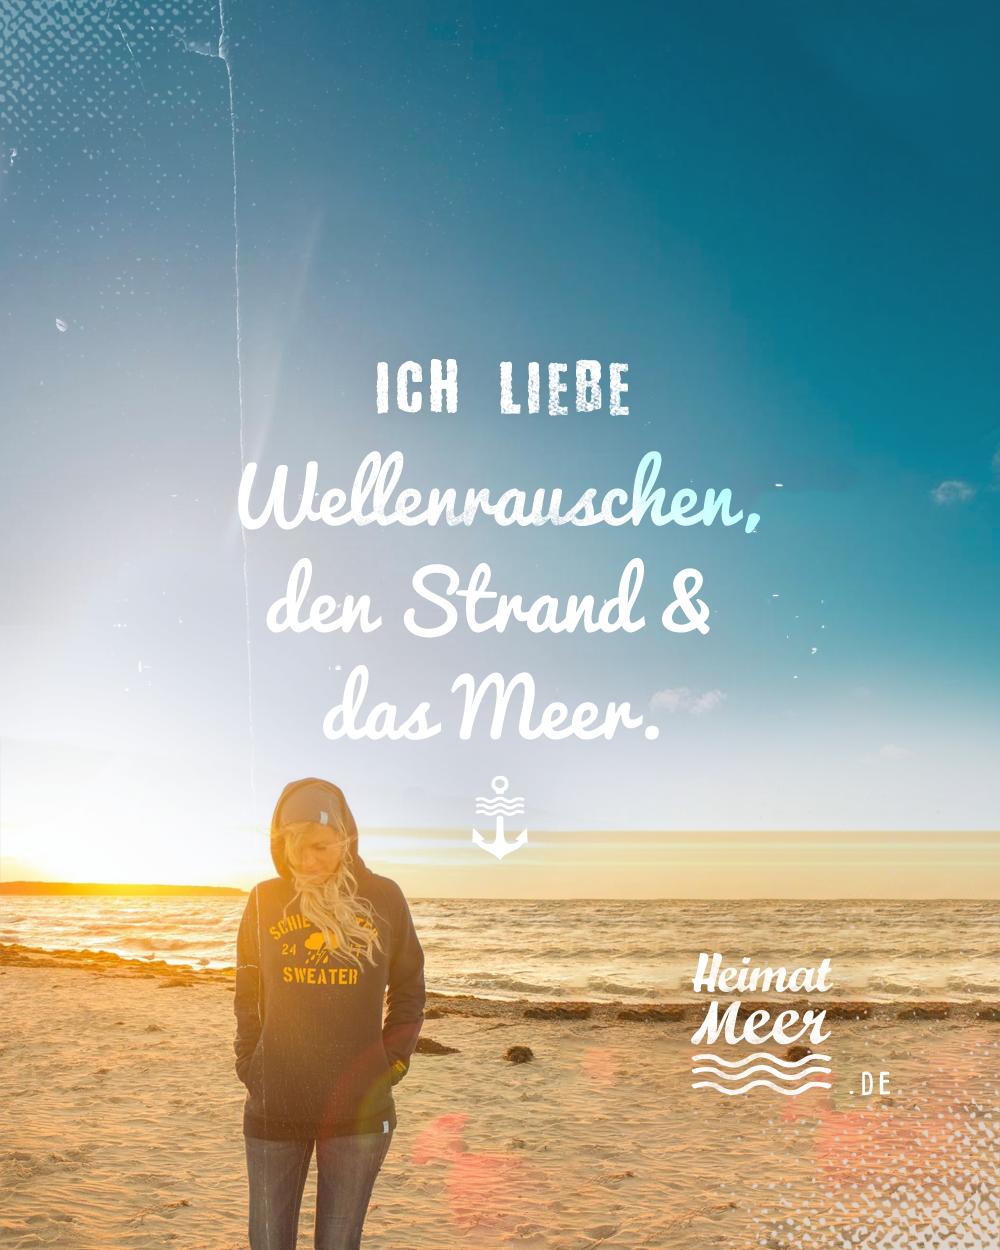 TEAM Wellenrauschen, Strand & Meer 🌊🌊🌊! Du auch? Dann wirst du Heimatmeer lieben >>